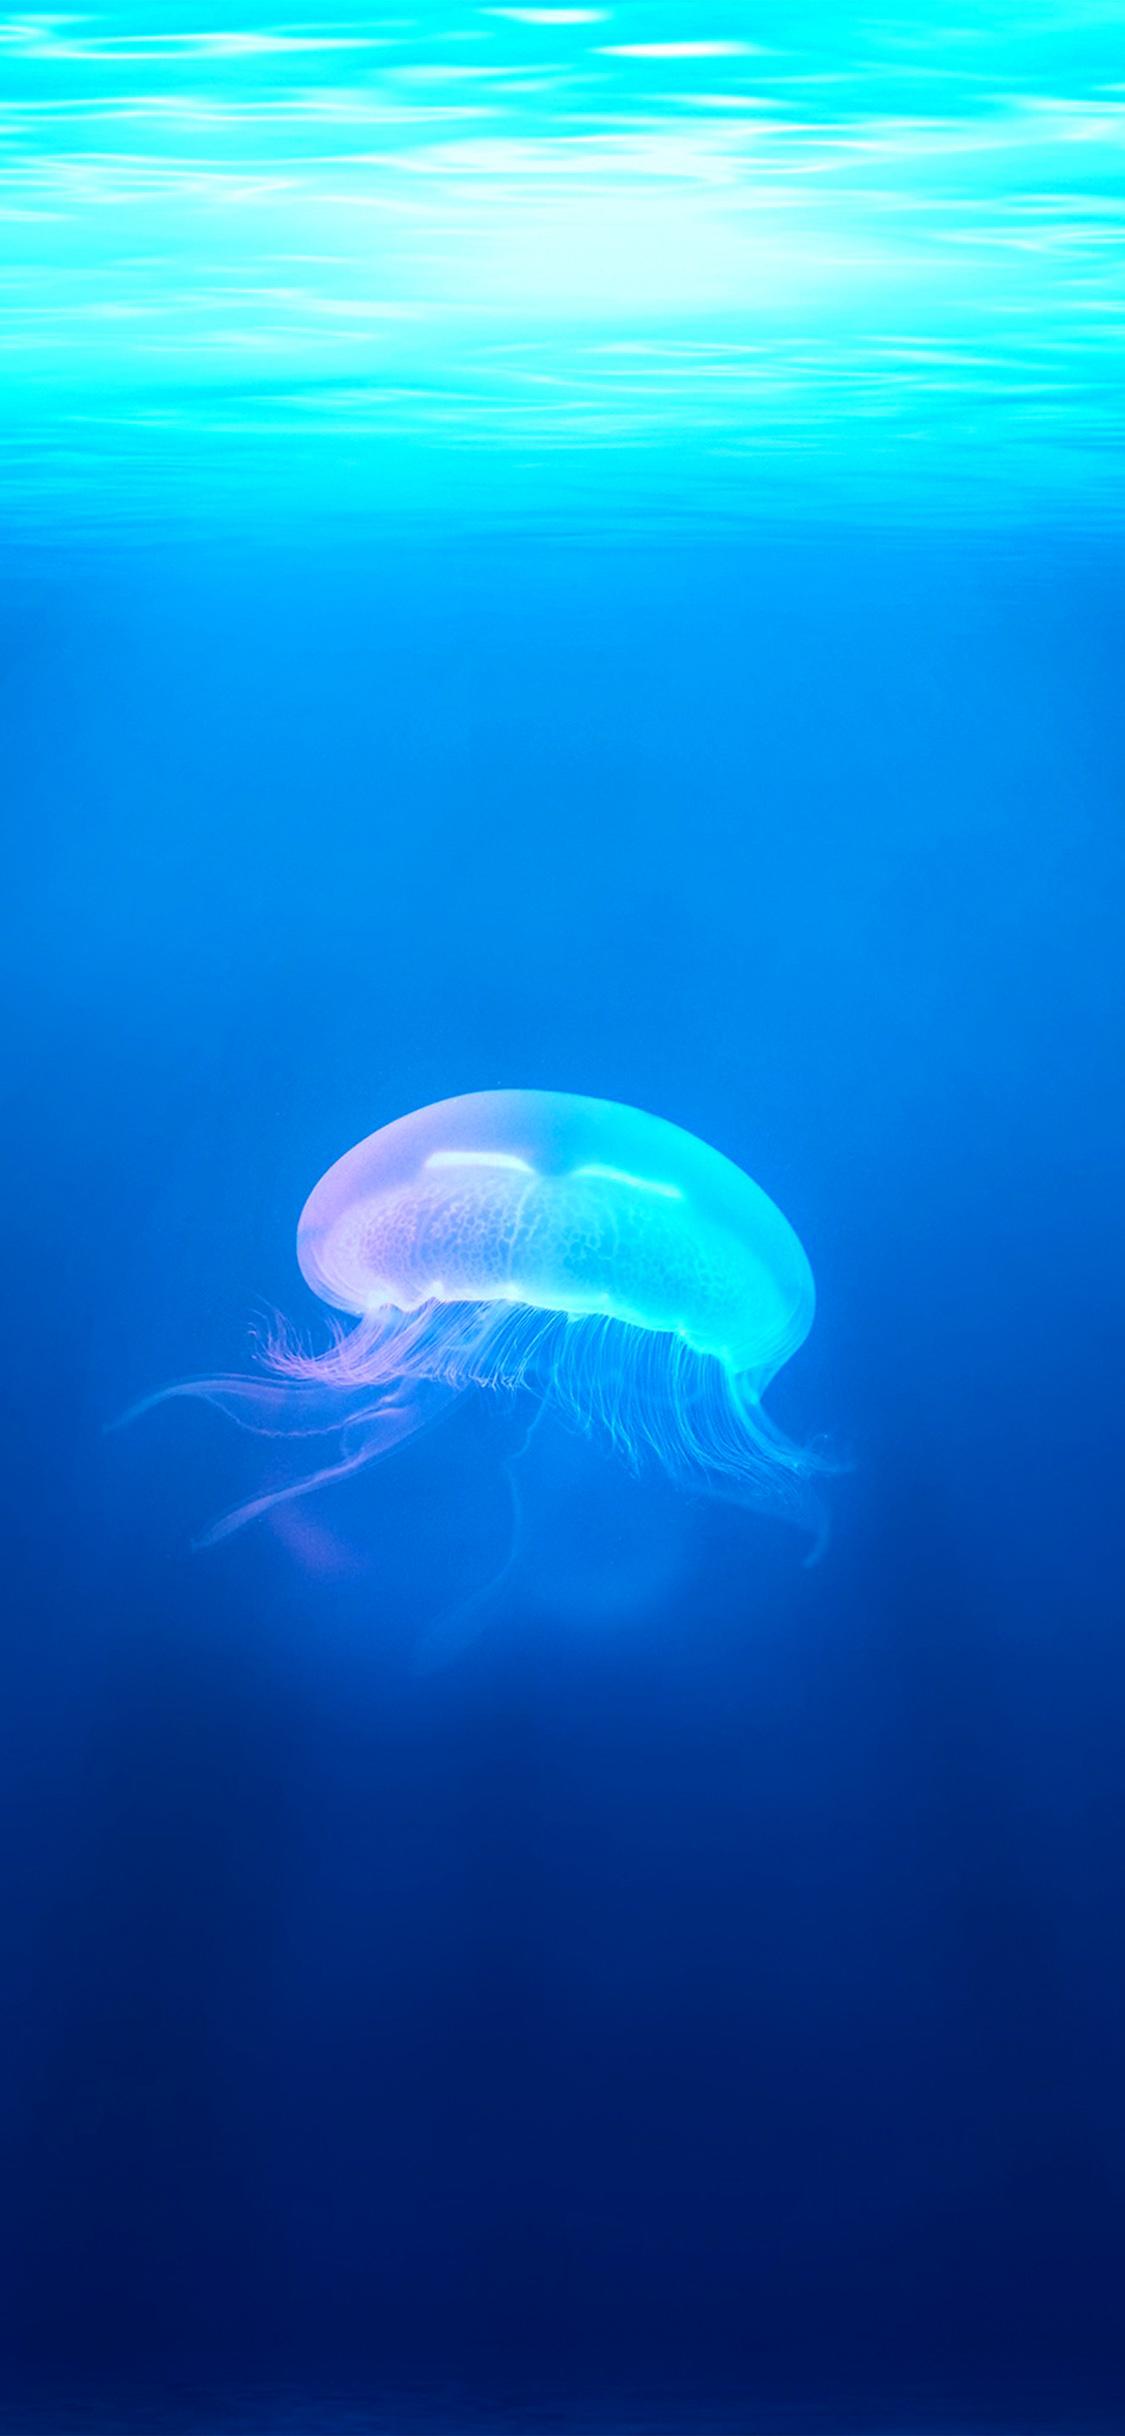 Na45 Jellyfish Sea Ocean Water Blue Animal Wallpaper